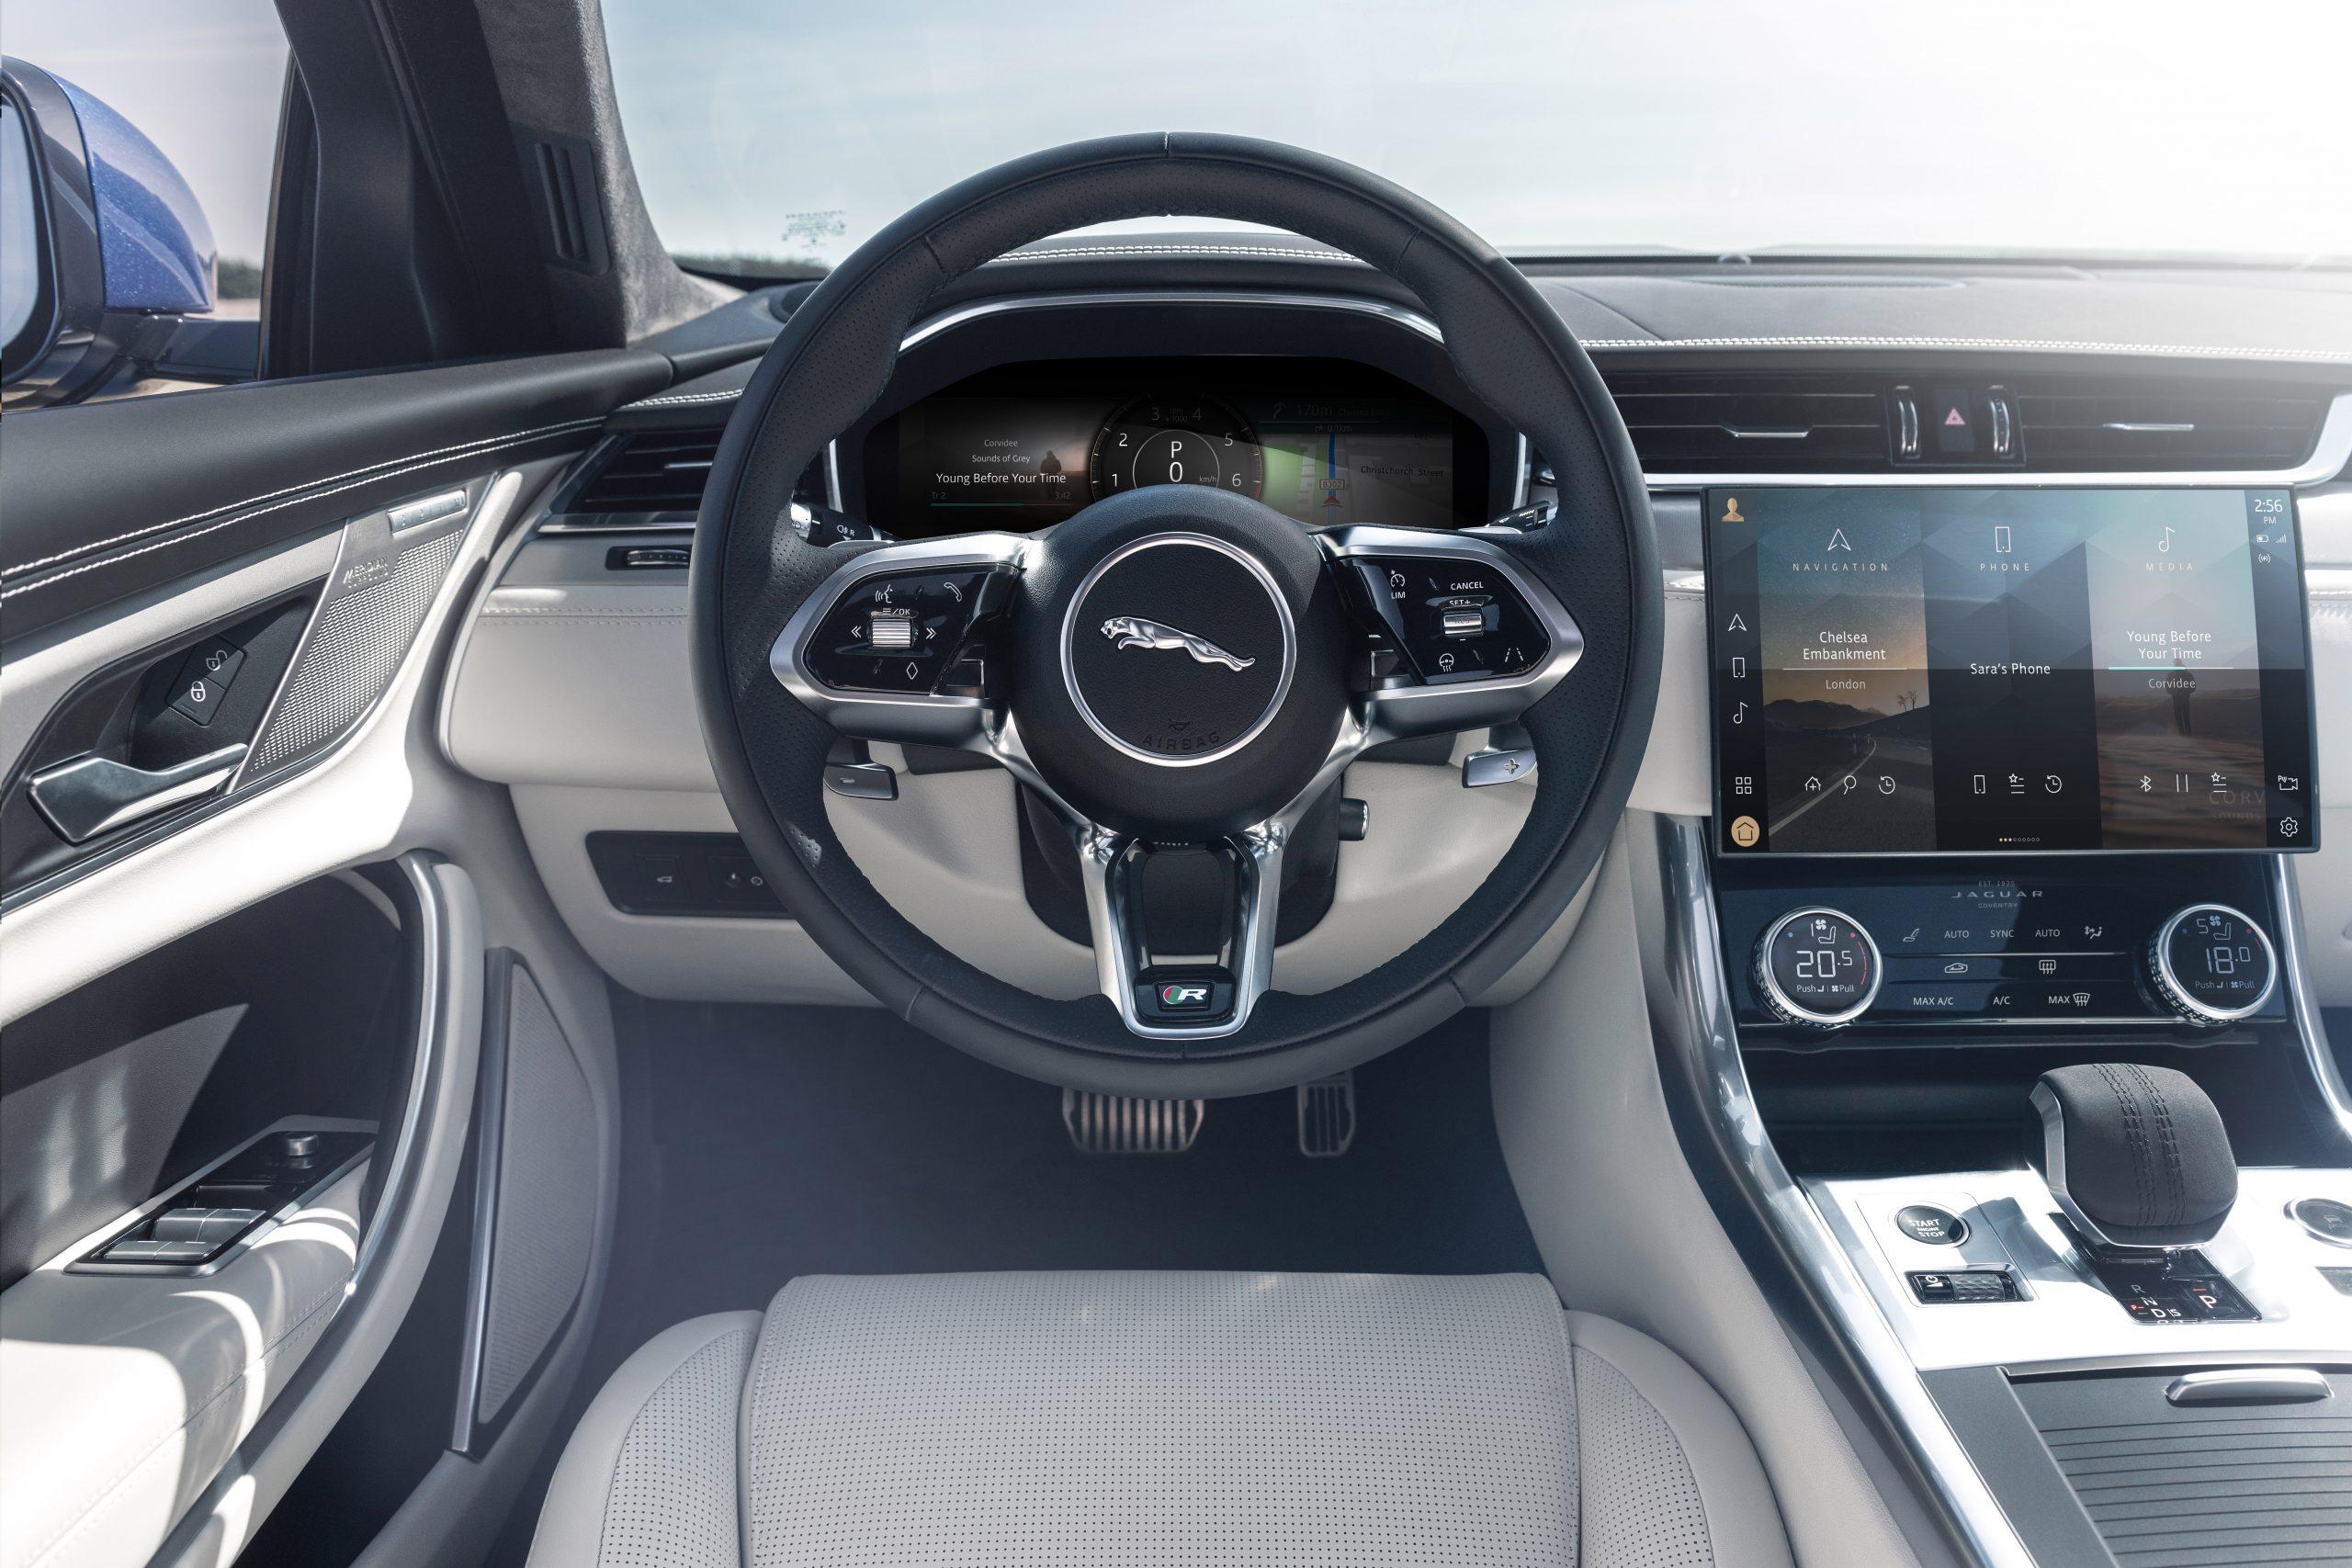 2021 Jaguar XF interior steering wheel